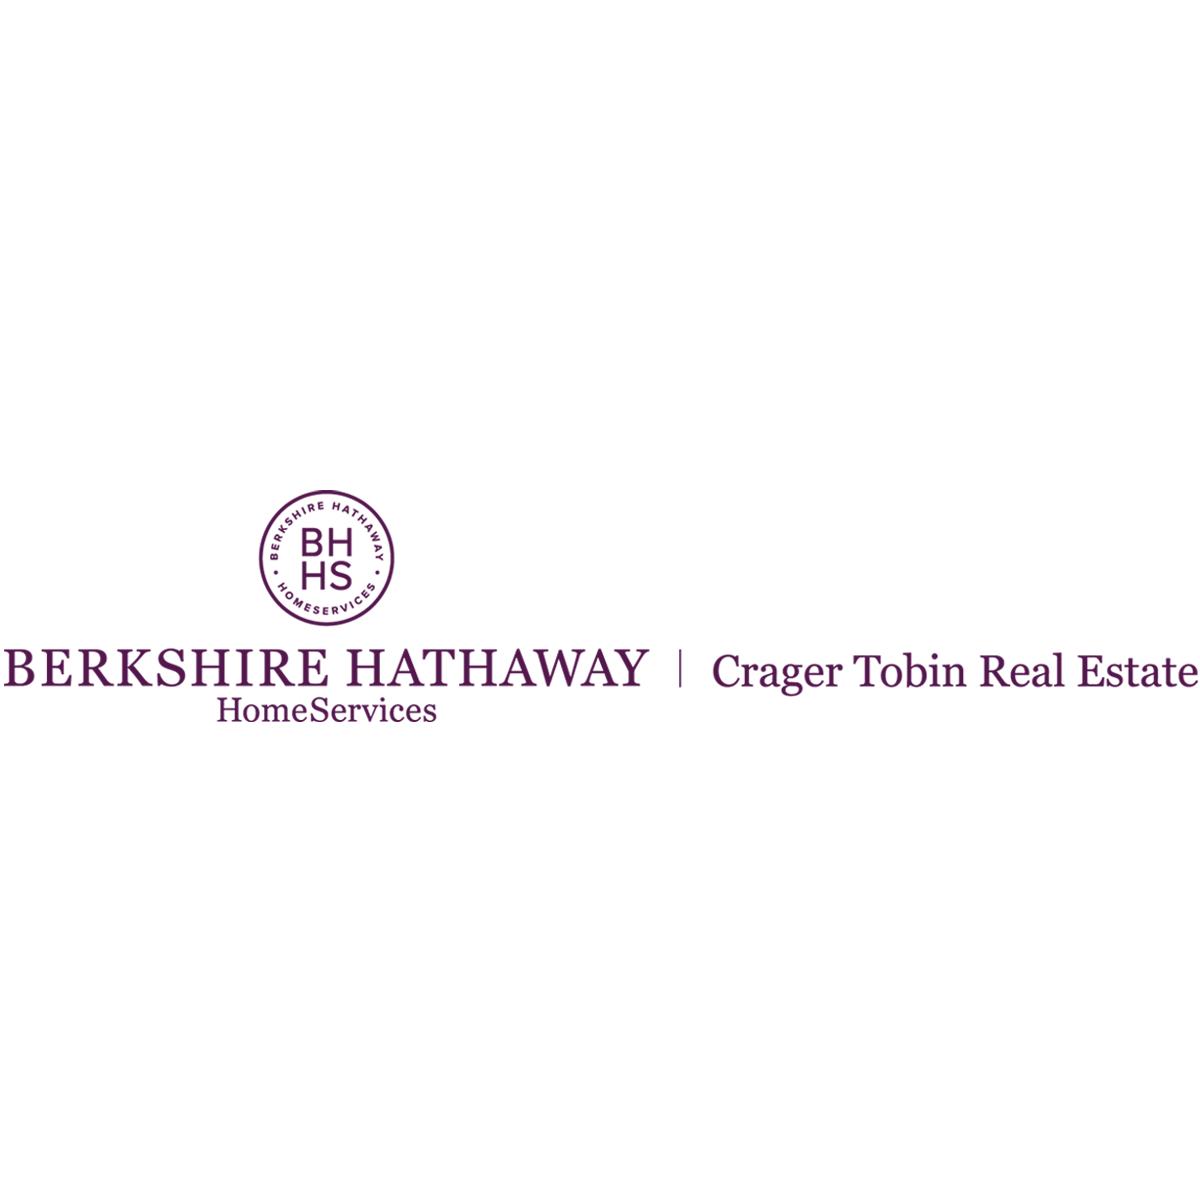 Berkshire Hathaway HomeServices Crager Tobin Real Estate